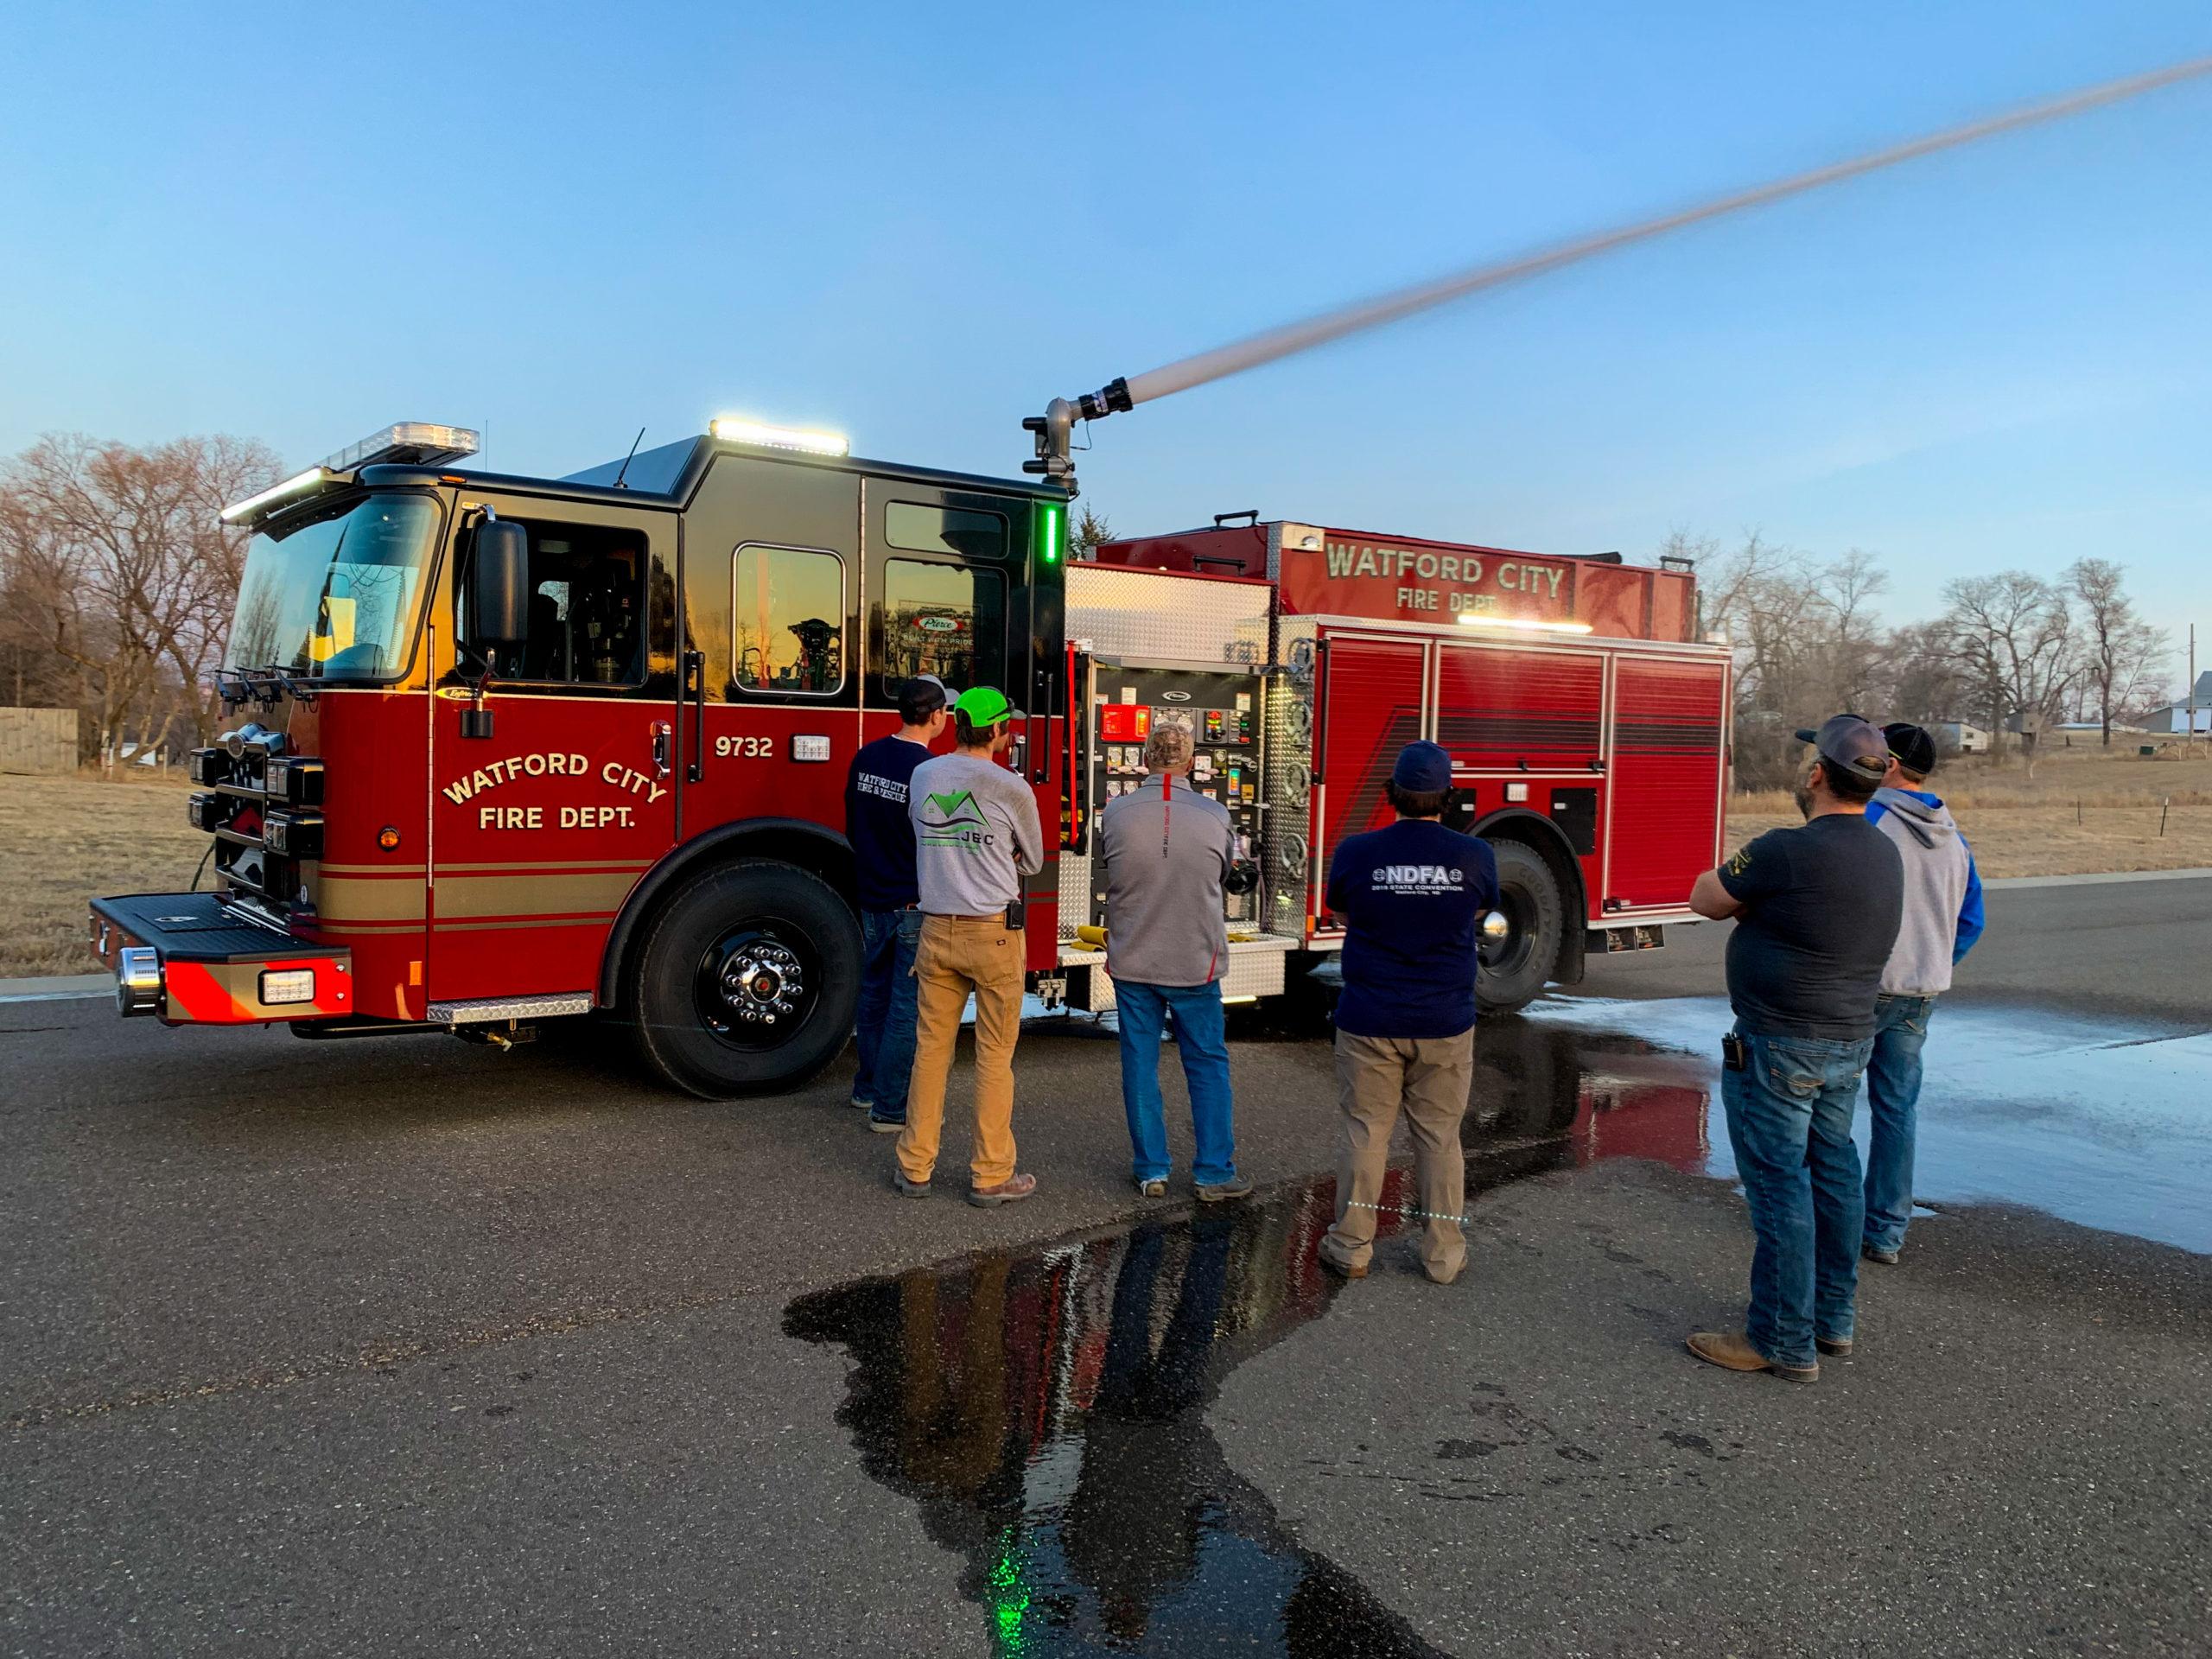 Watford City Fire Department - Pumper